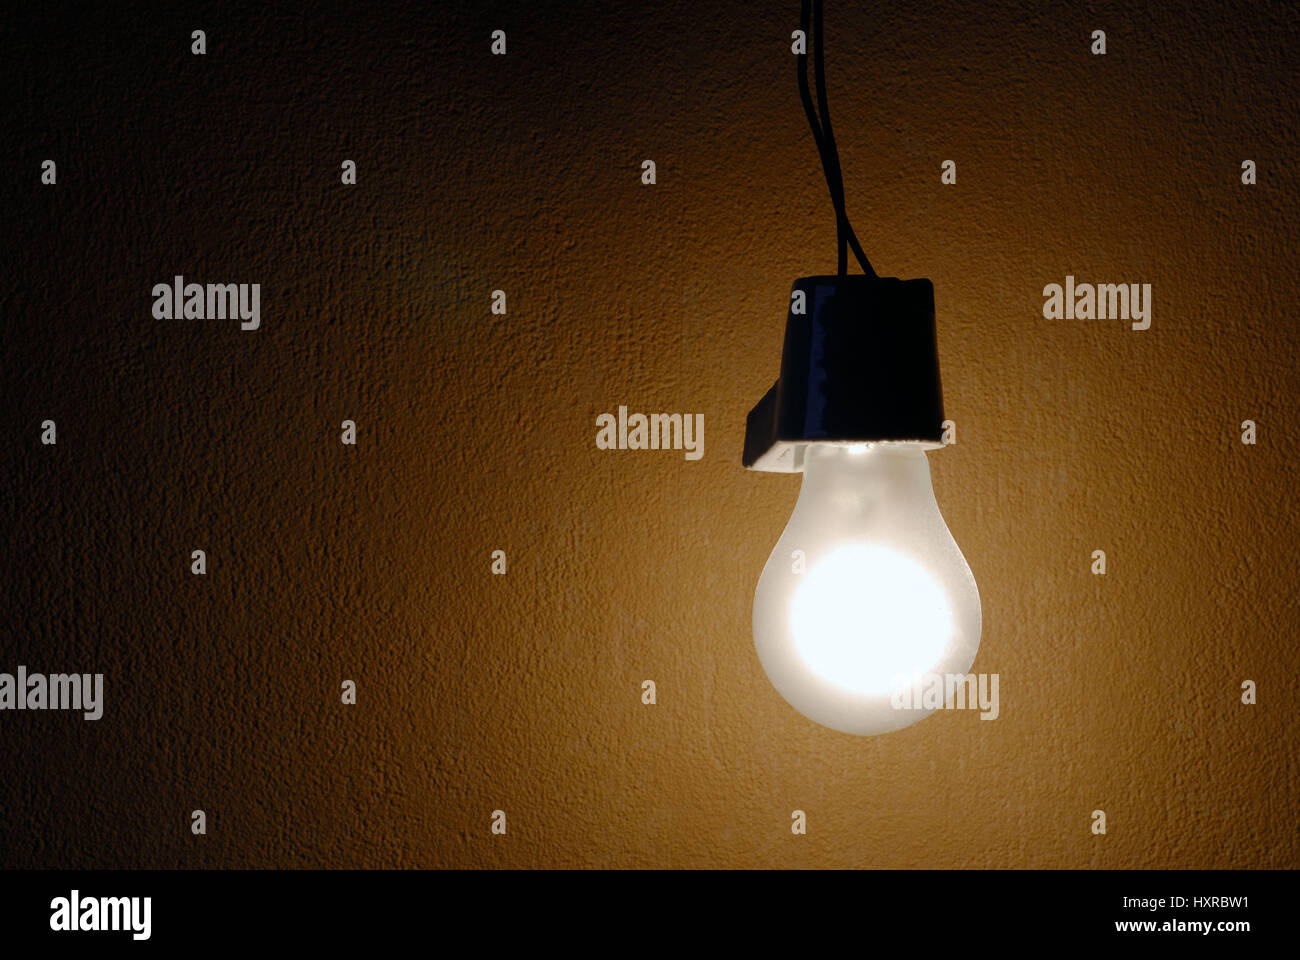 Electric light bulb, electric light bulbs, light bulb, light bulbs, classical, classically, climate killer, power - Stock Image